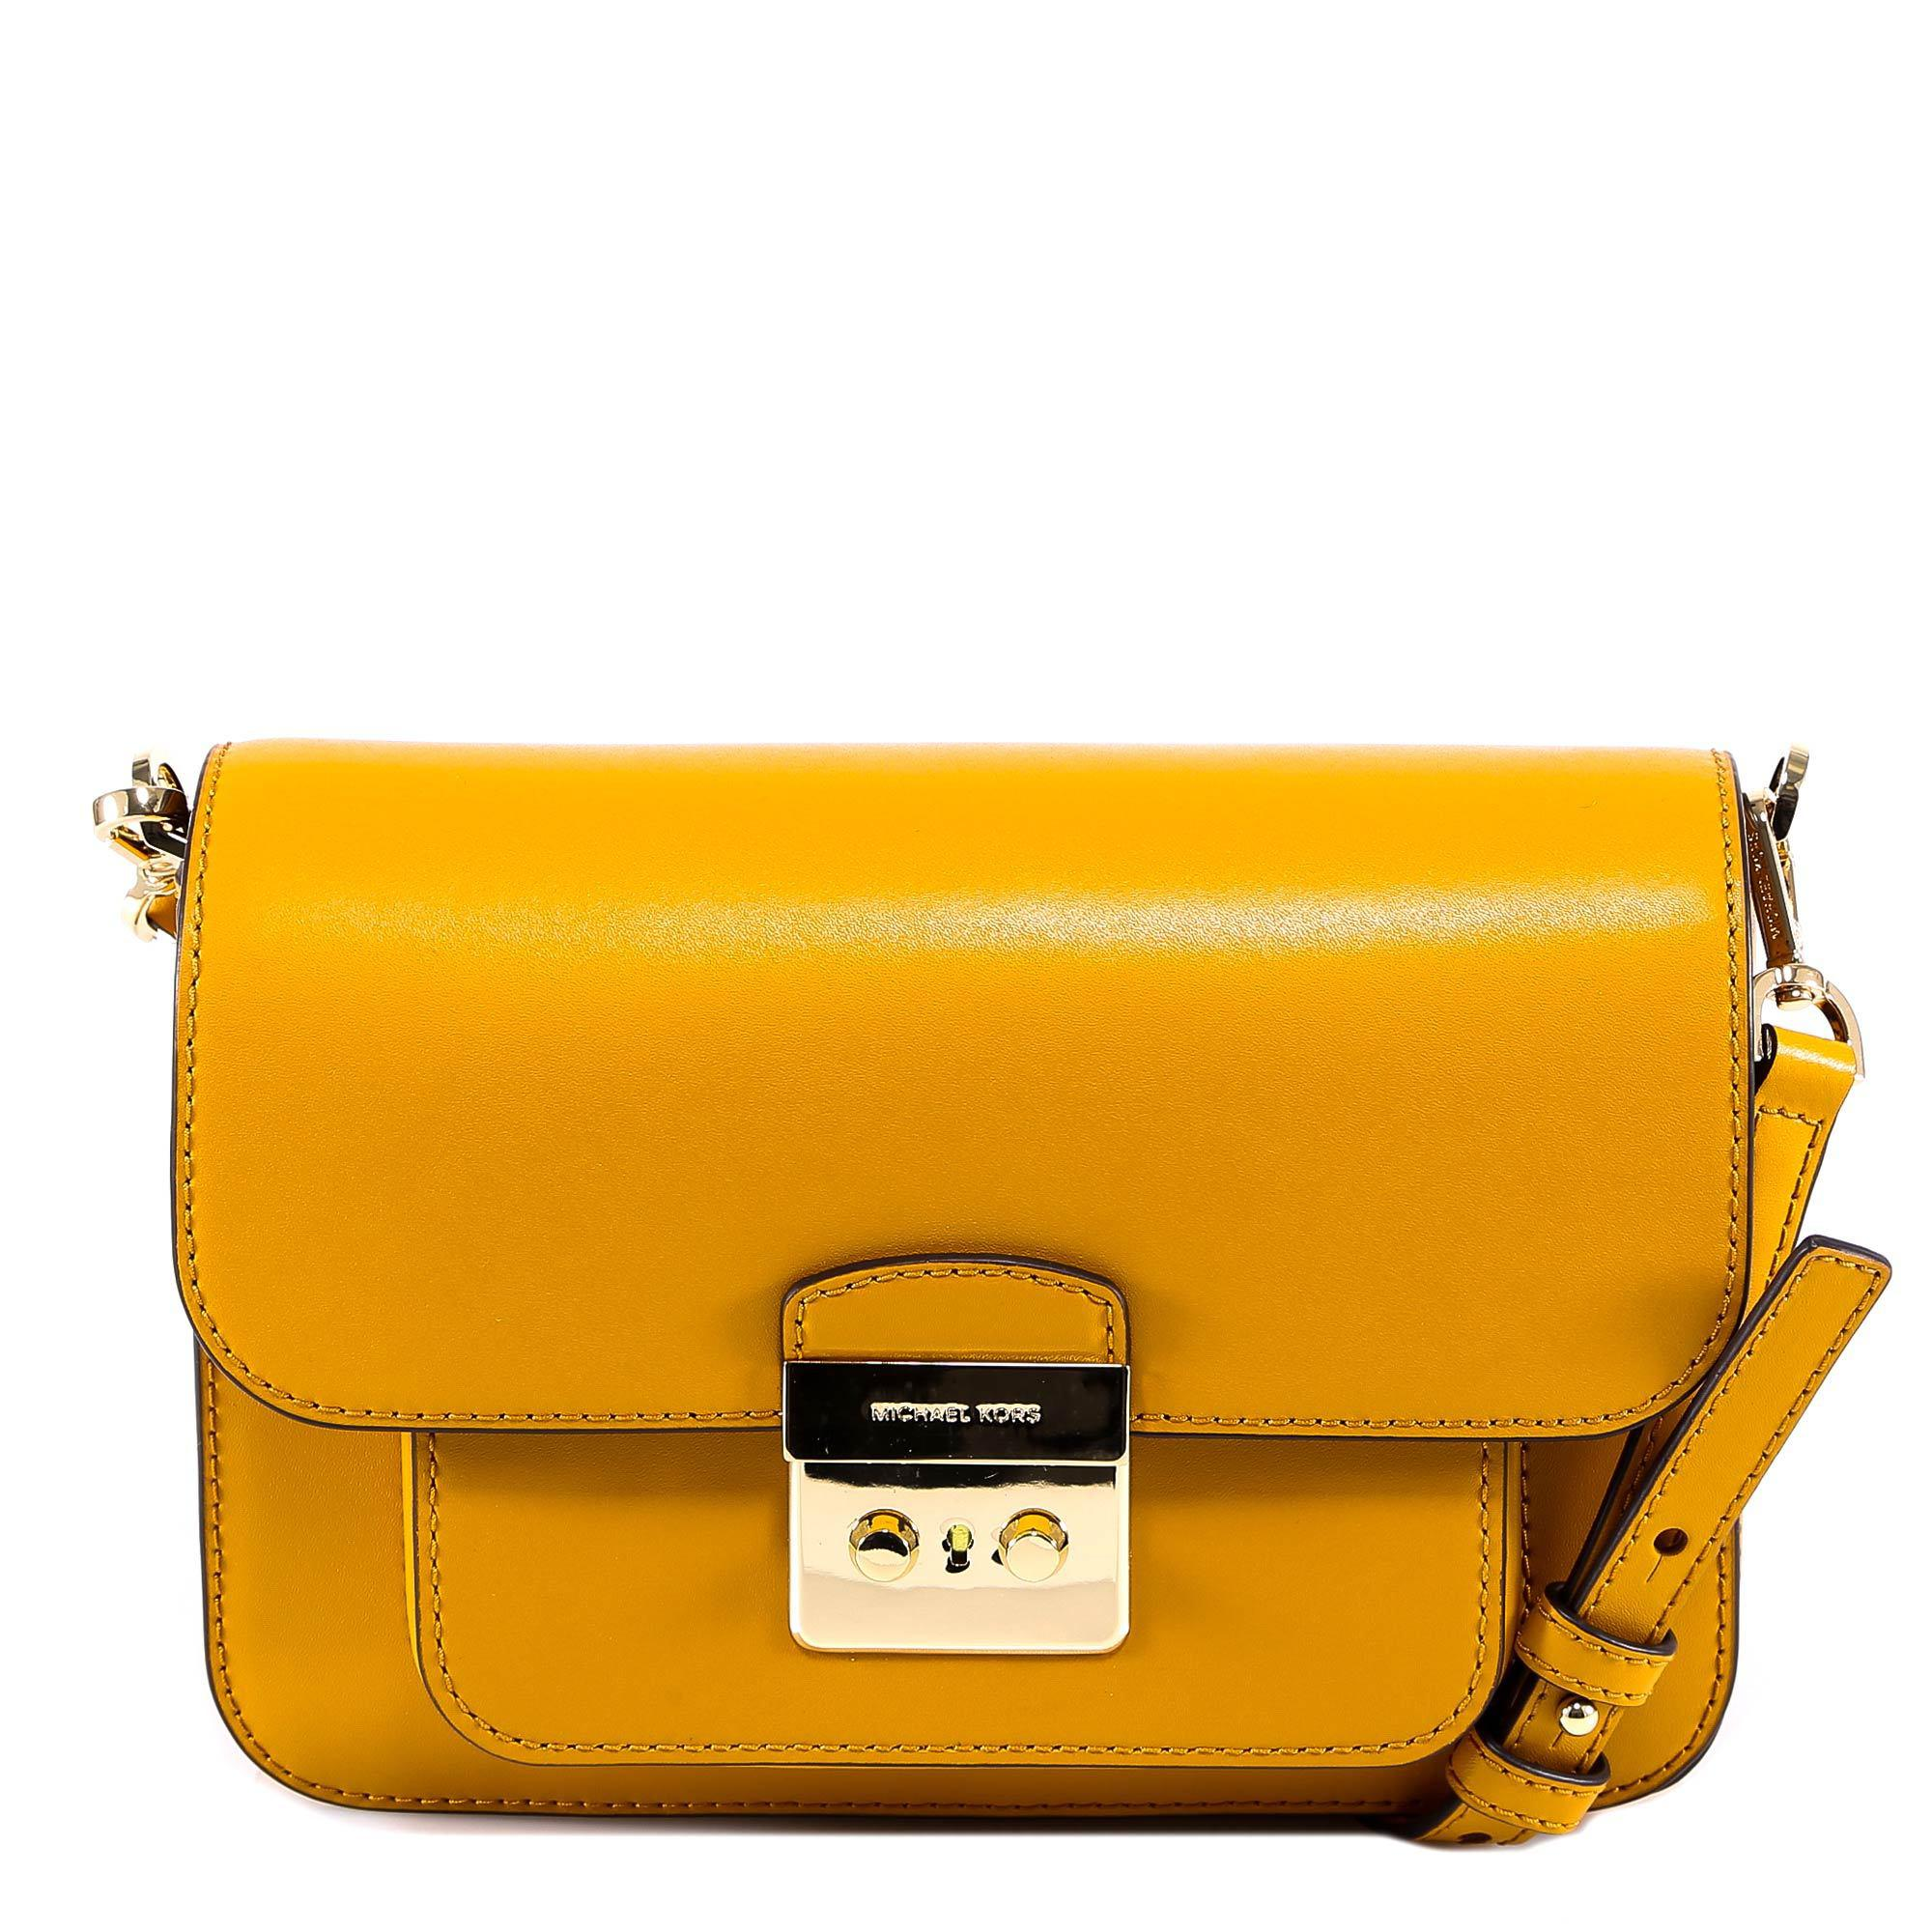 5e6a8f92e7455 Michael Michael Kors Sloan Shoulder Bag in Metallic - Lyst